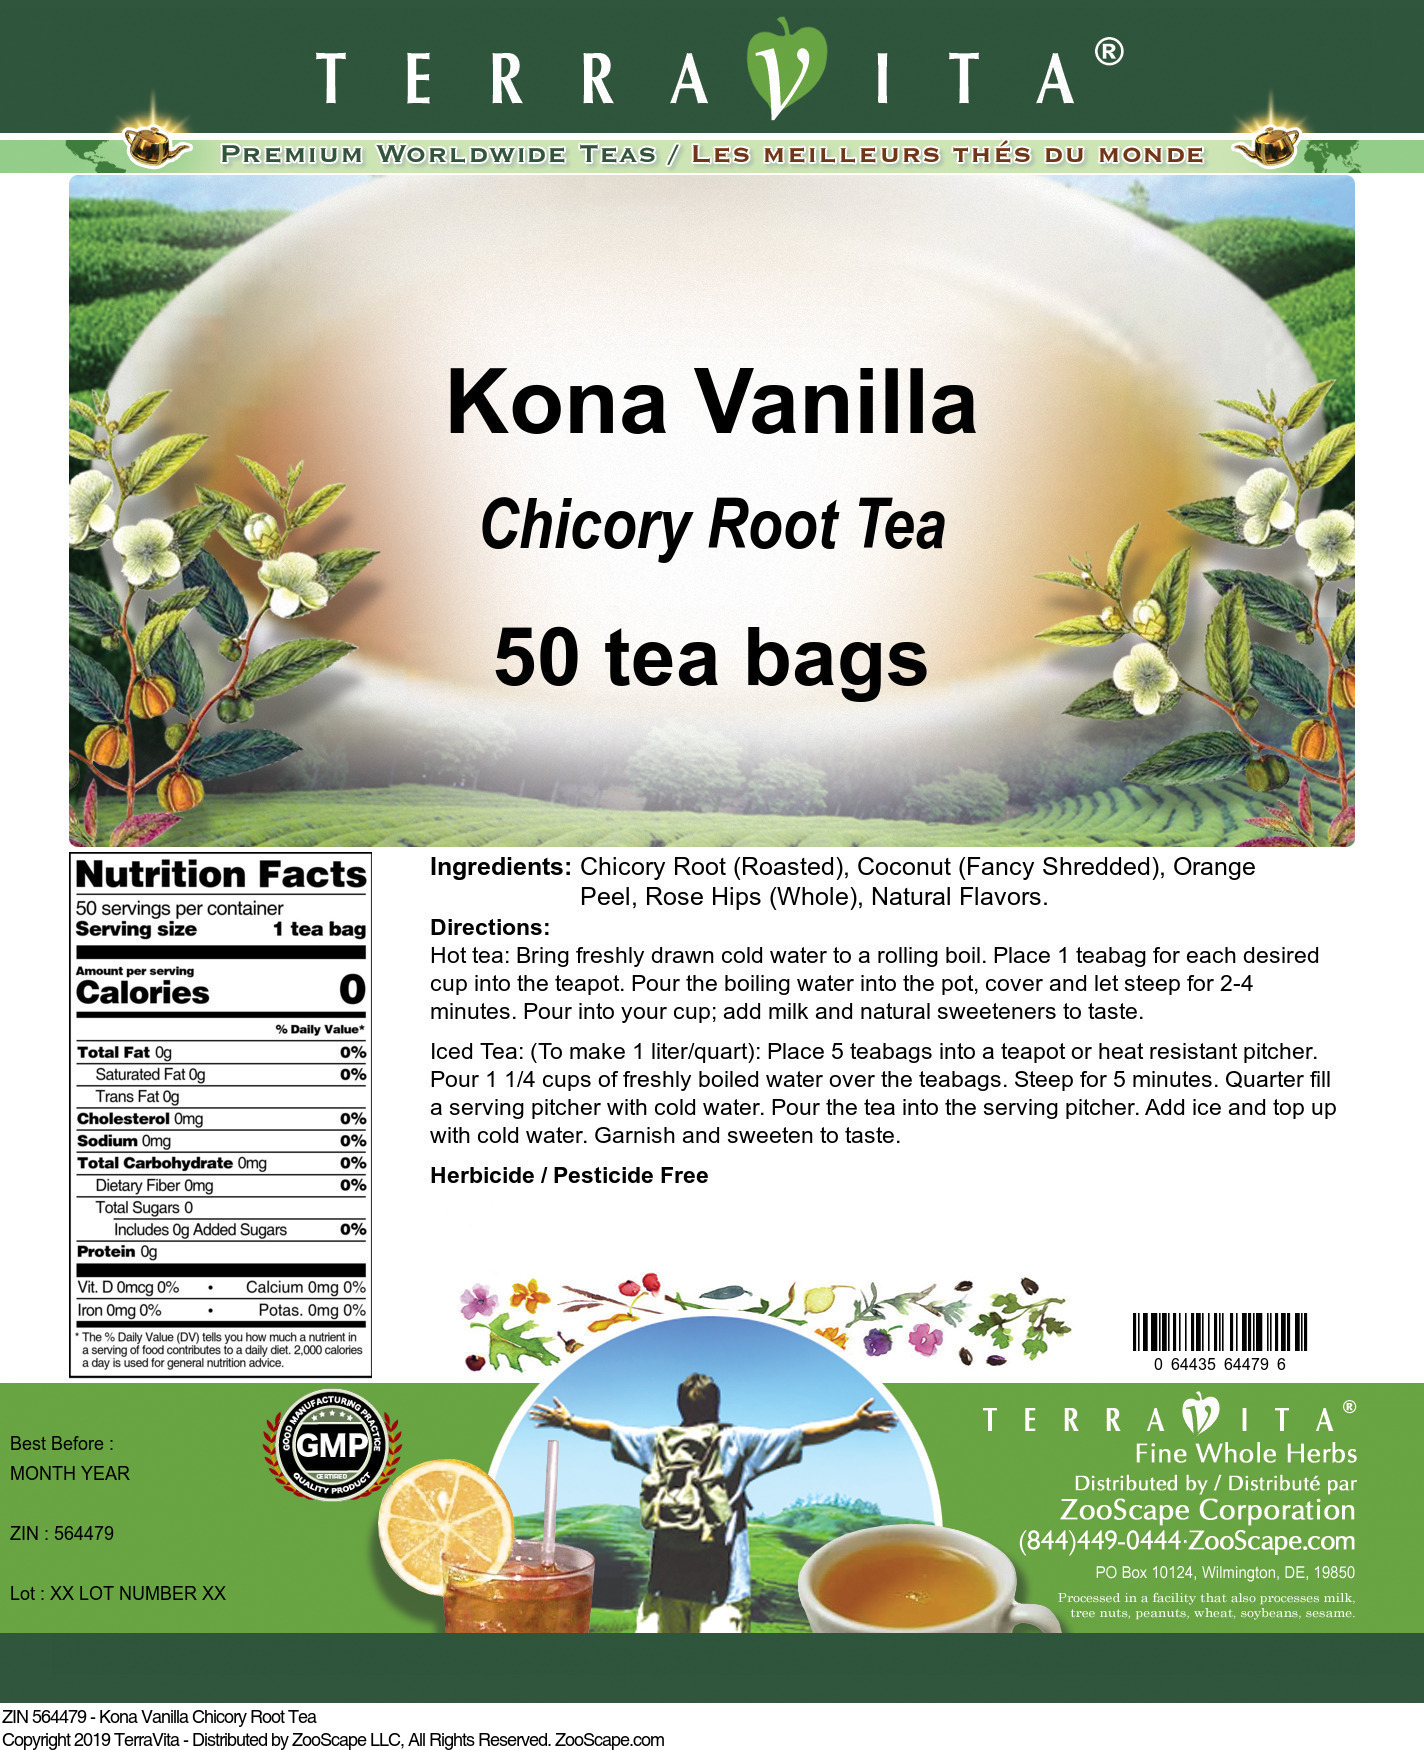 Kona Vanilla Chicory Root